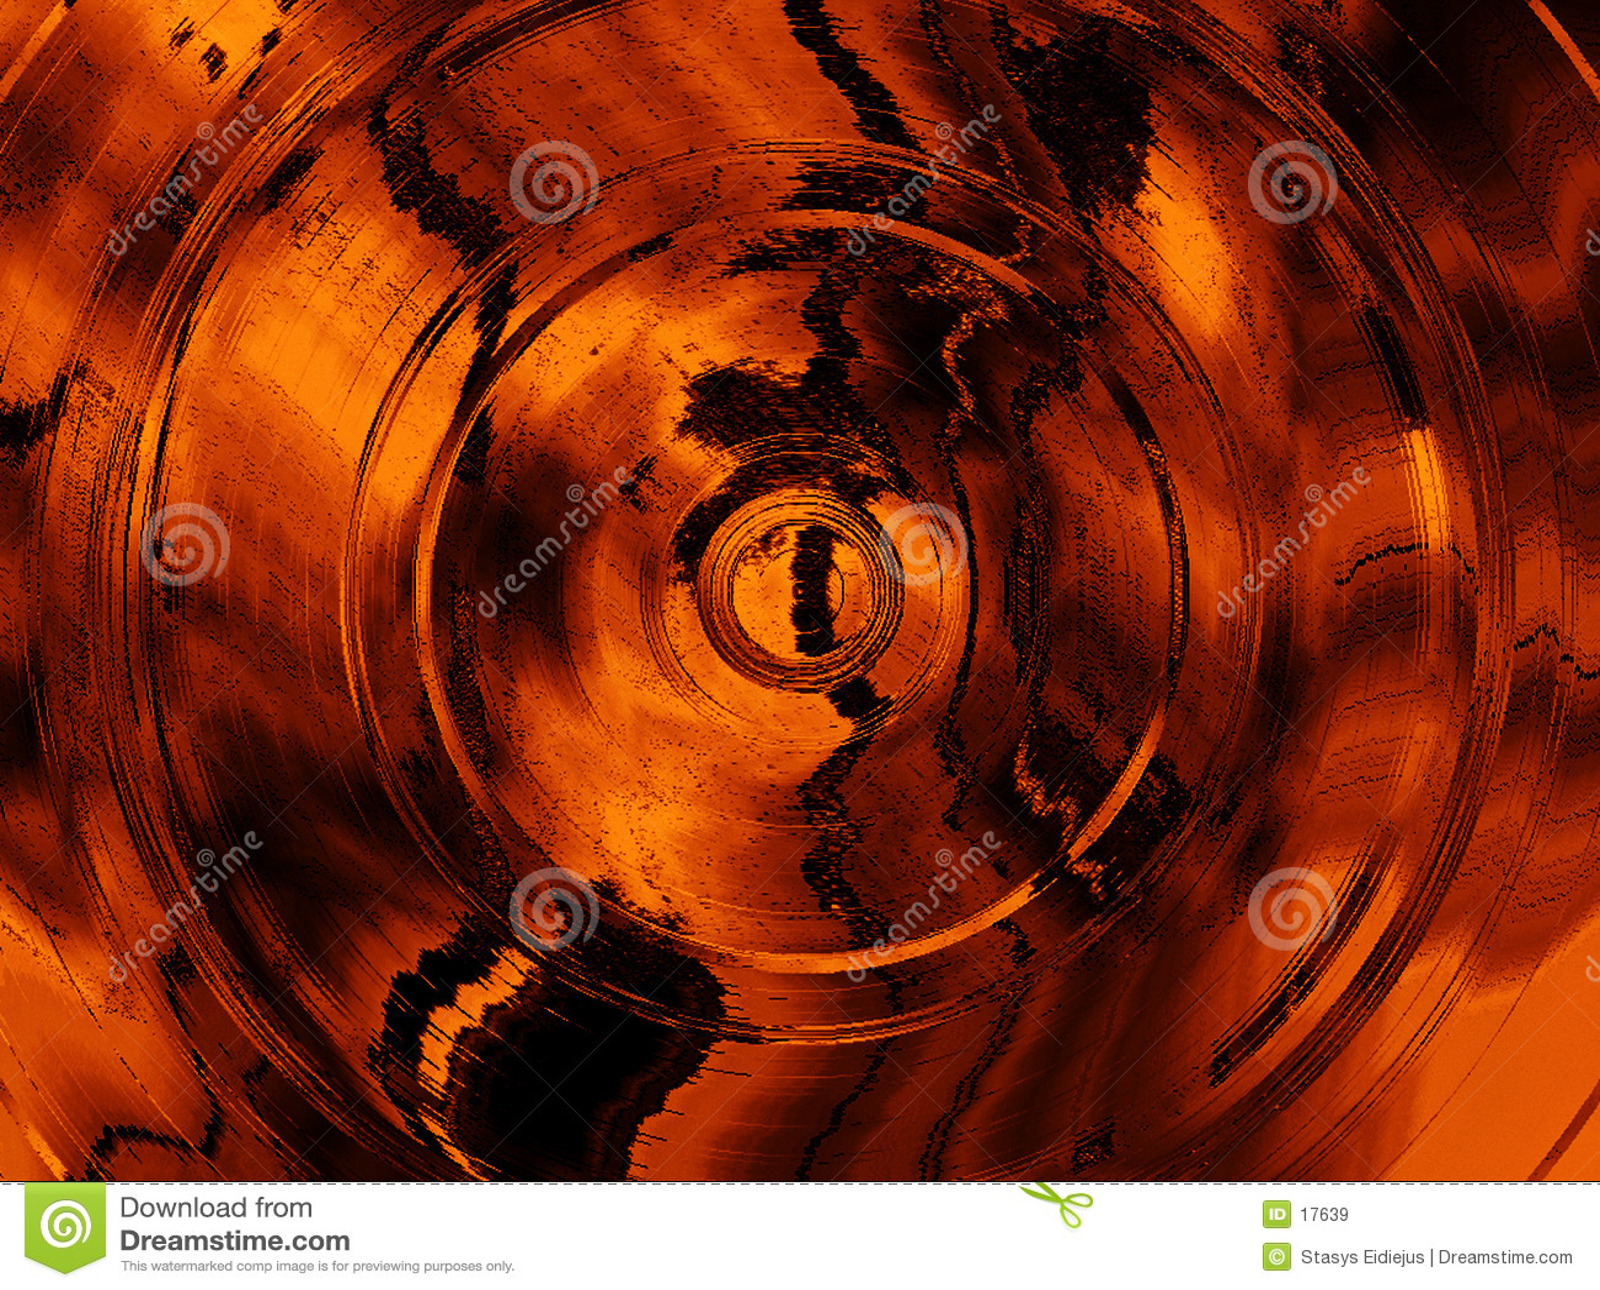 Abstracte grunge textuur als achtergrond, met cirkels